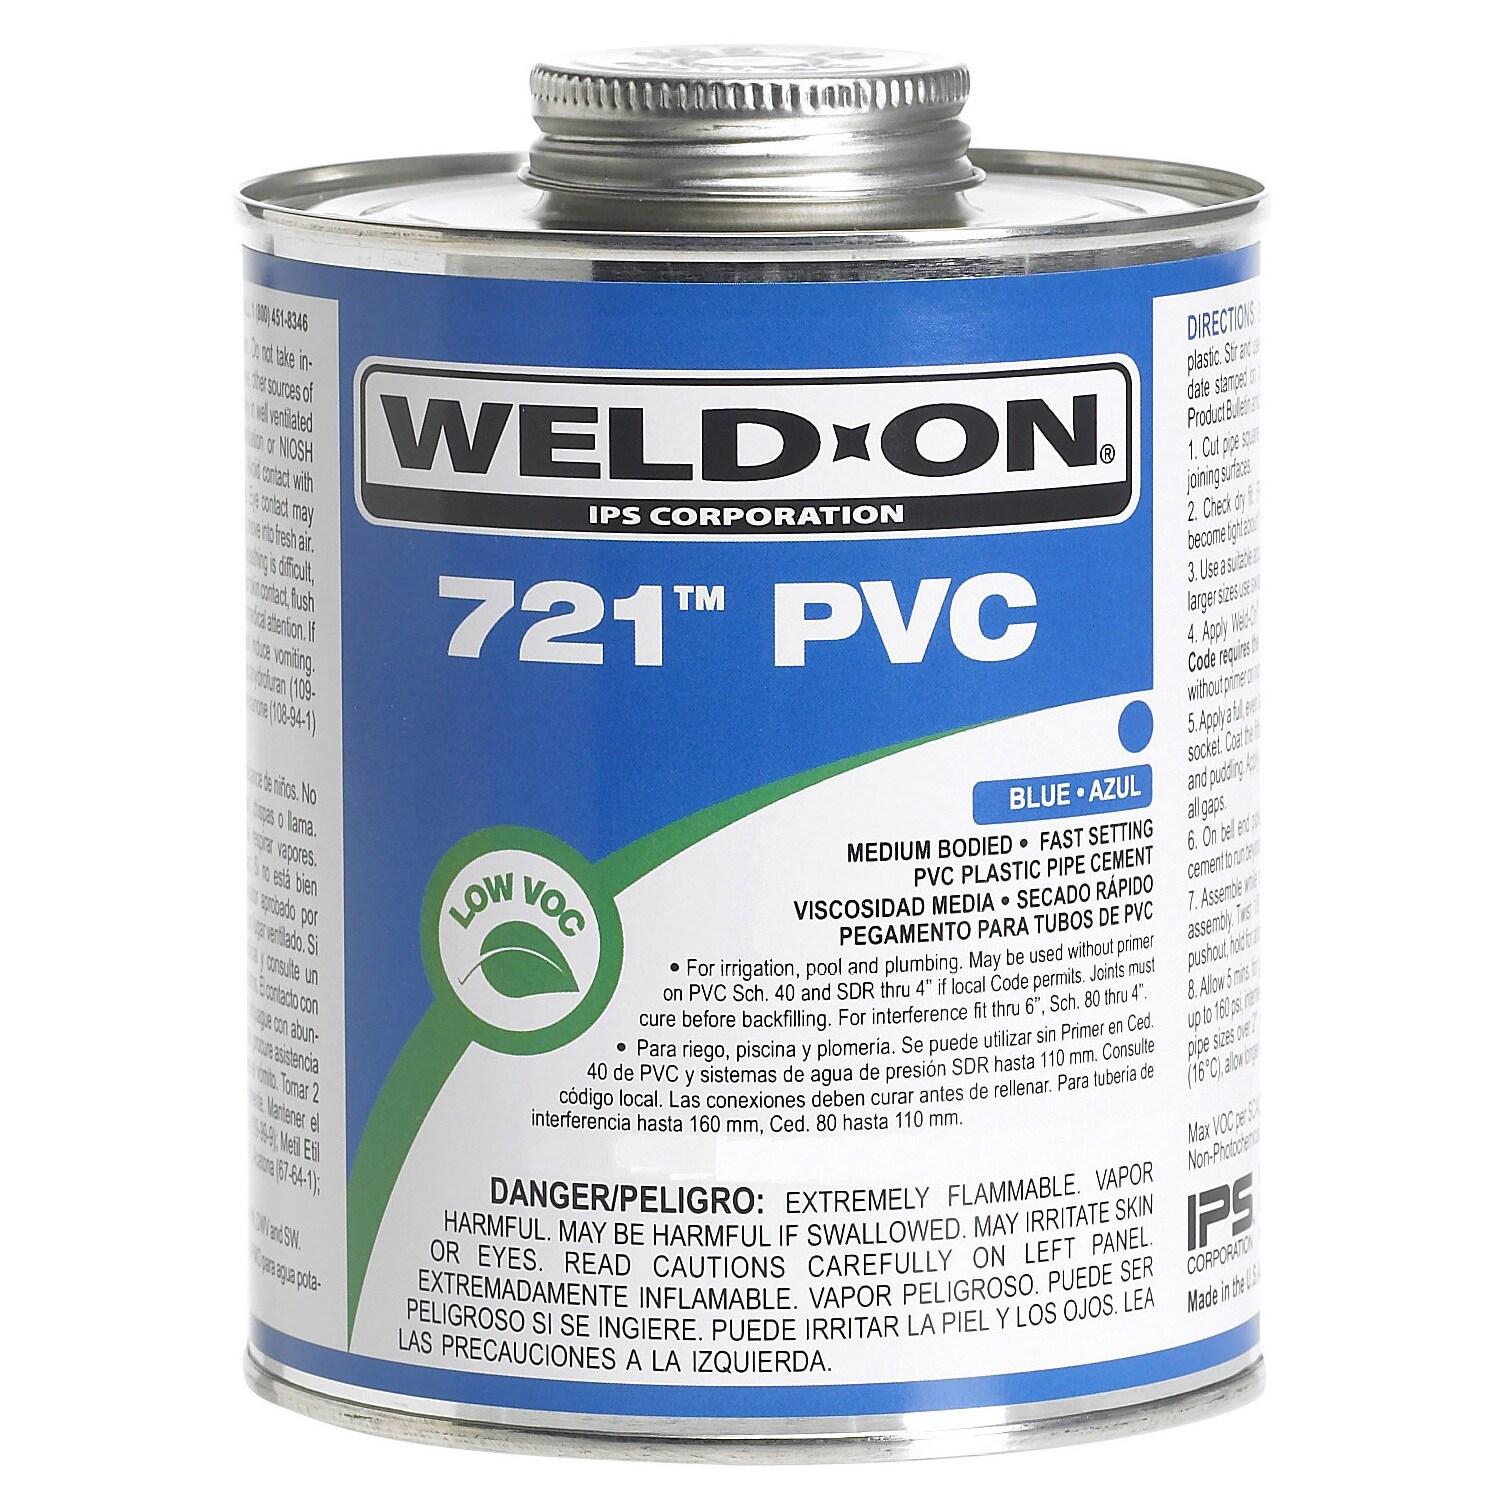 Ips Weldon 10162 1 Pint Blue 721 PVC Cement (Pvc Blue Med...